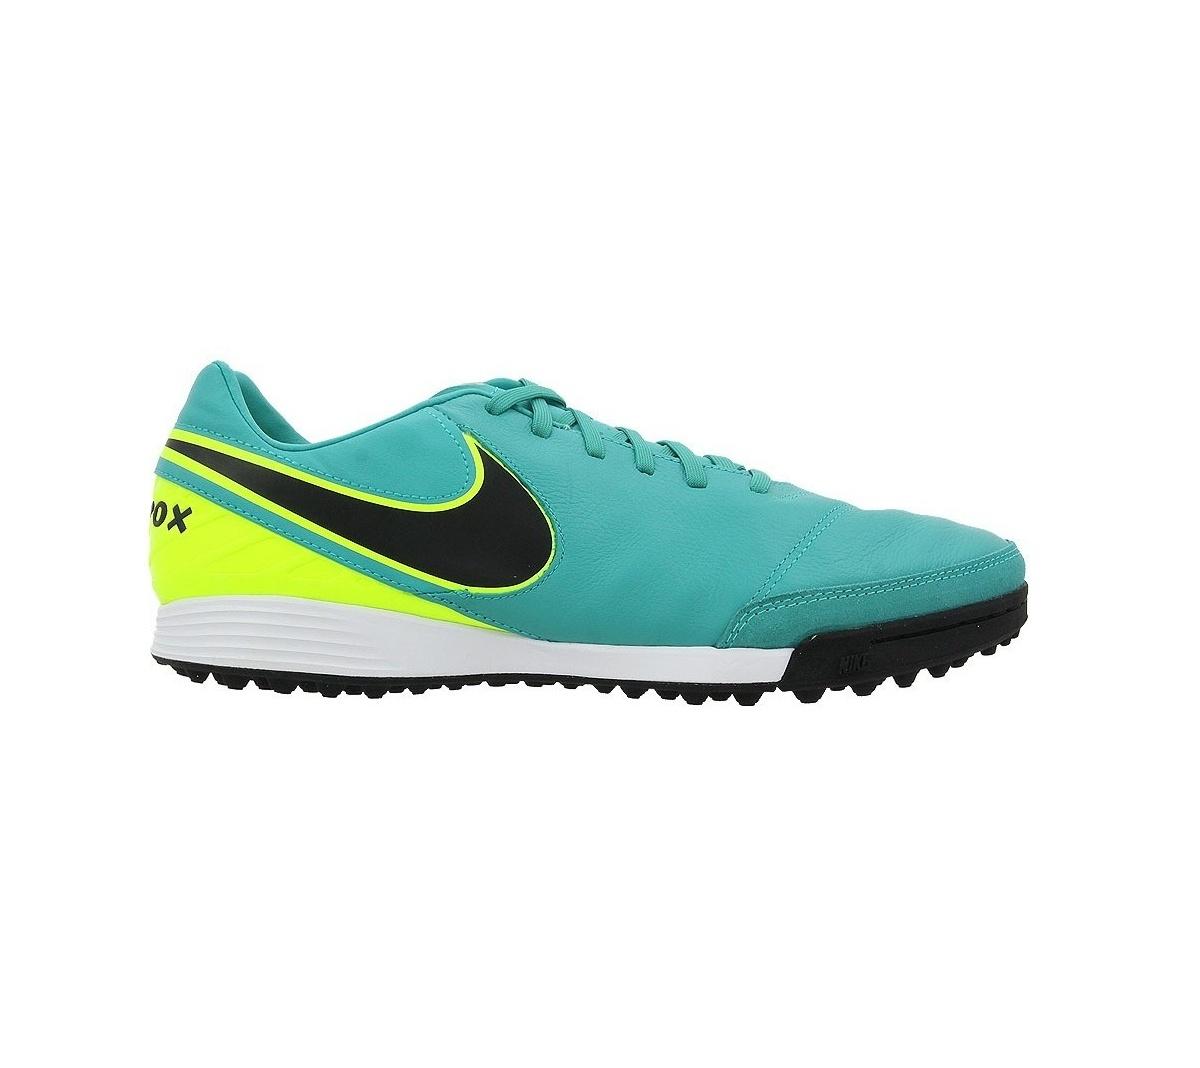 cb2f578463 Chuteira Nike Tiempo Mystic V Society Vd - Mundo do Futebol